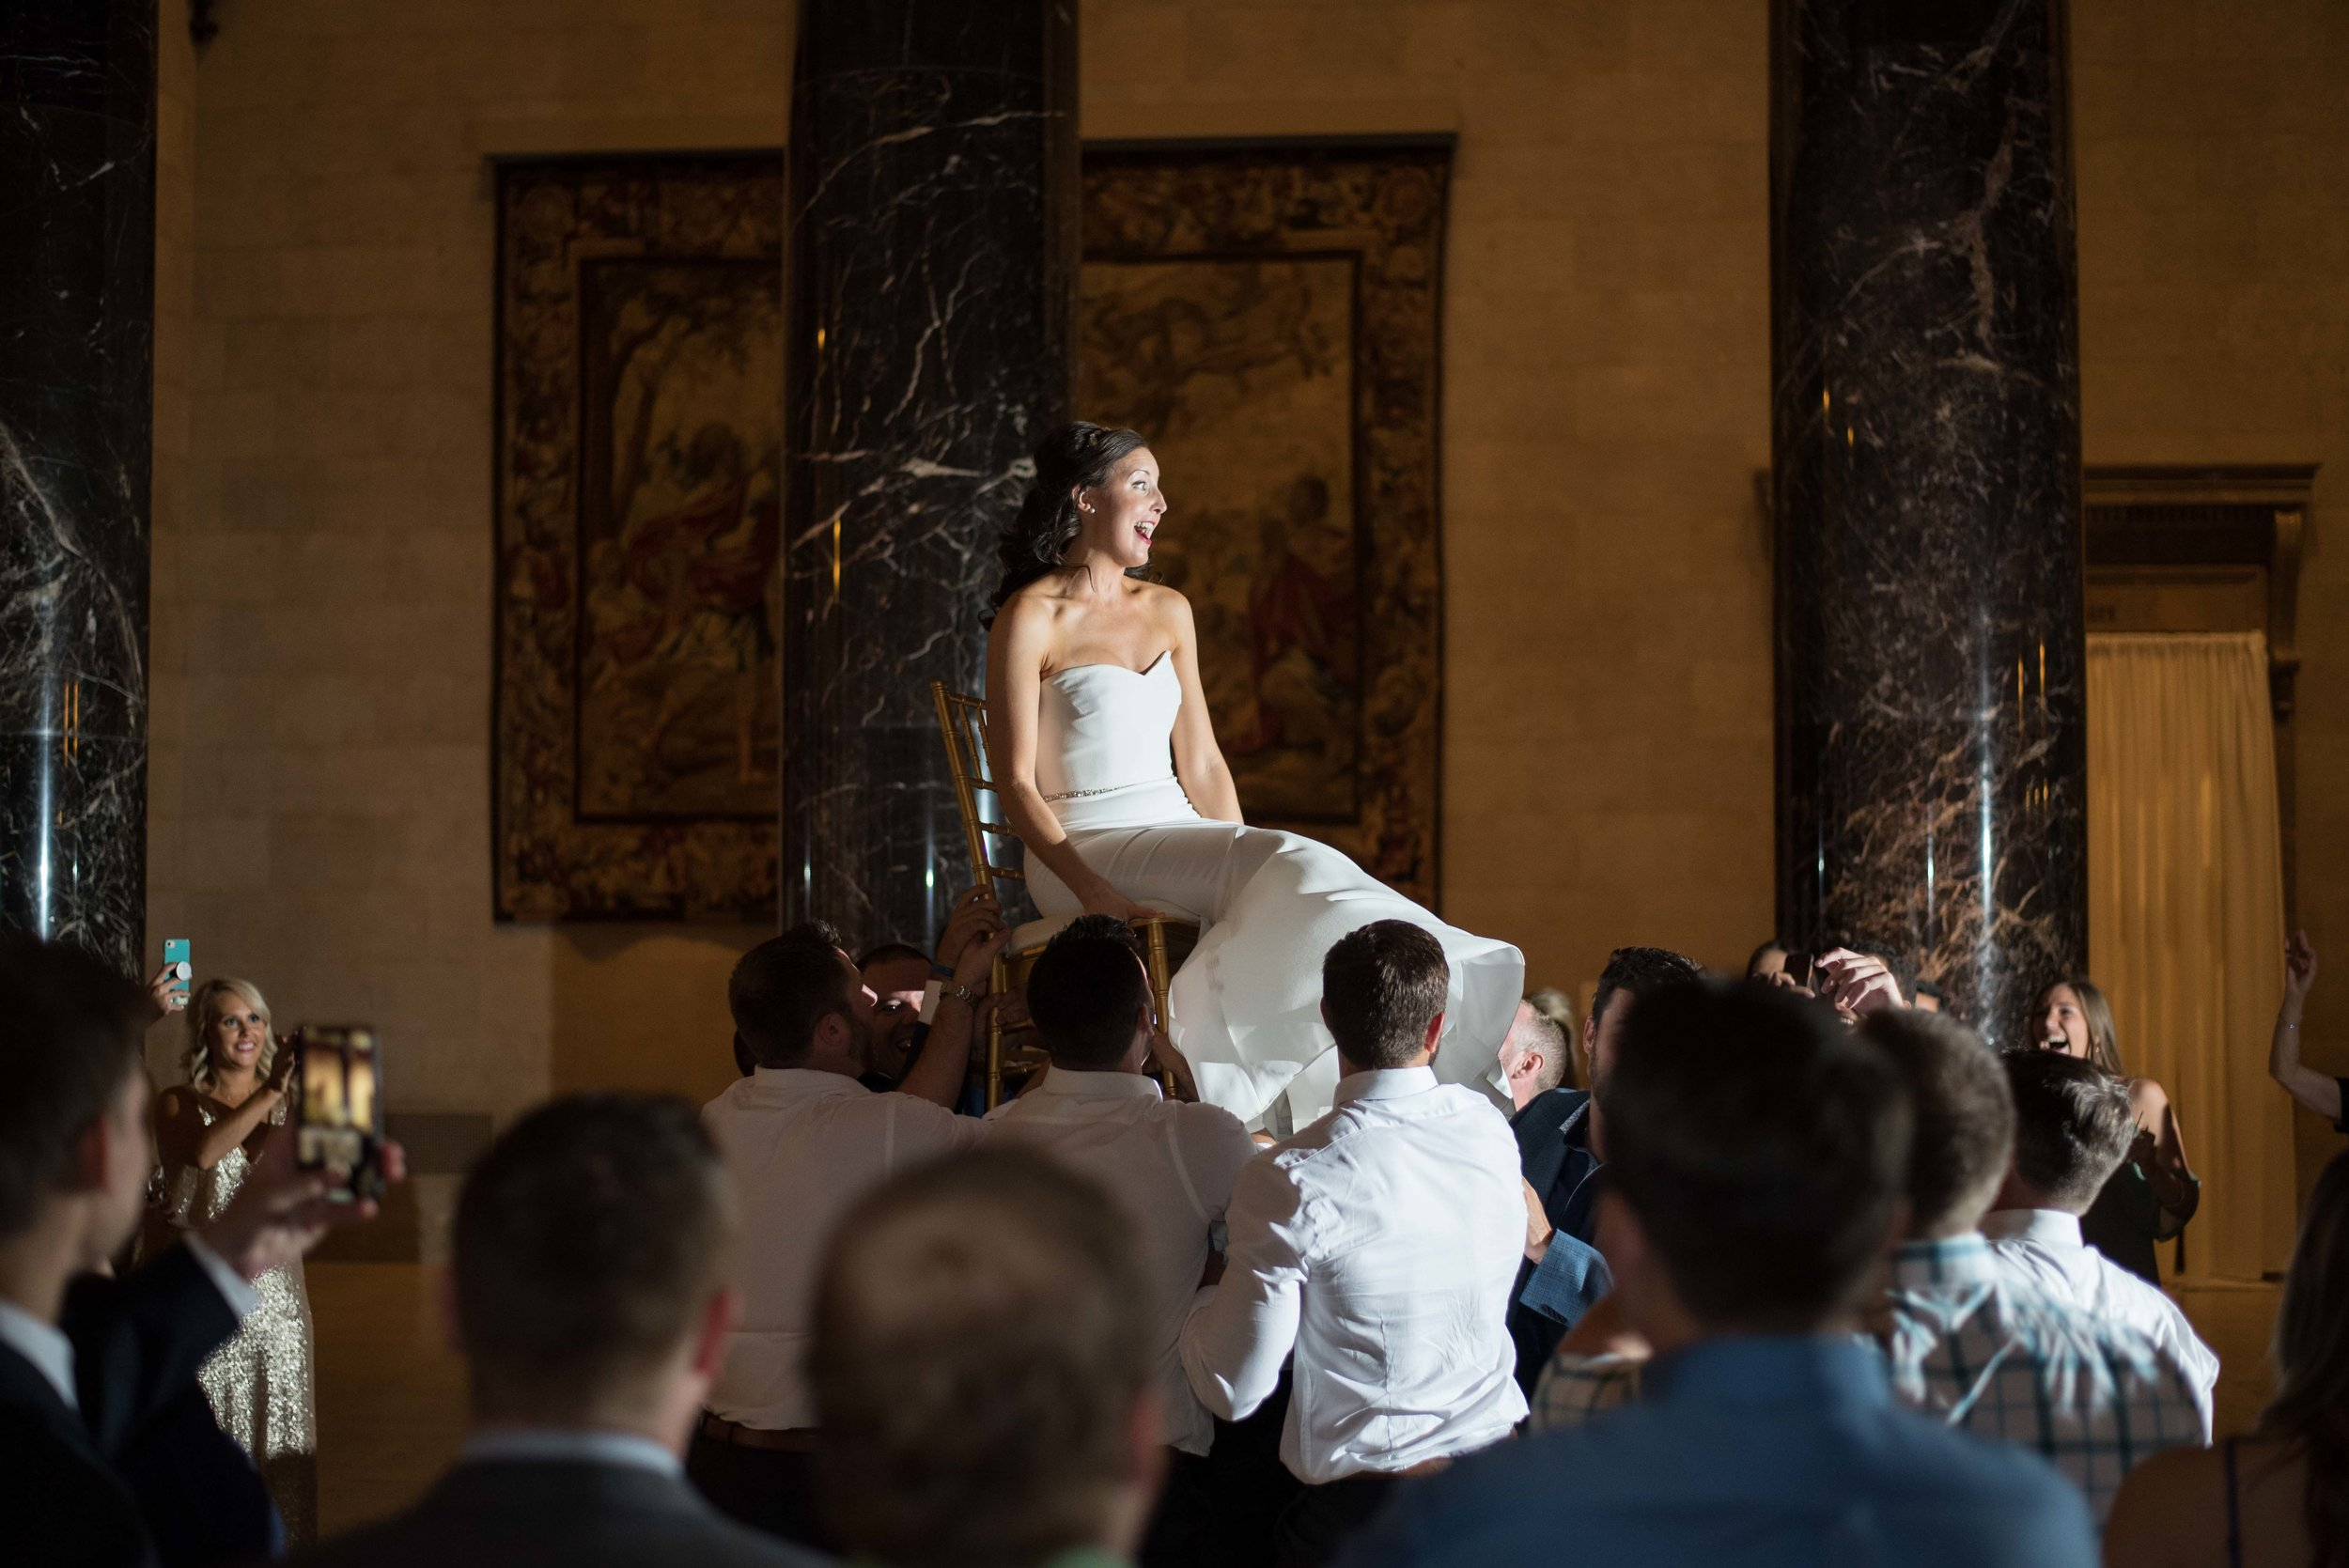 nelson-atkins-wedding-91.jpg